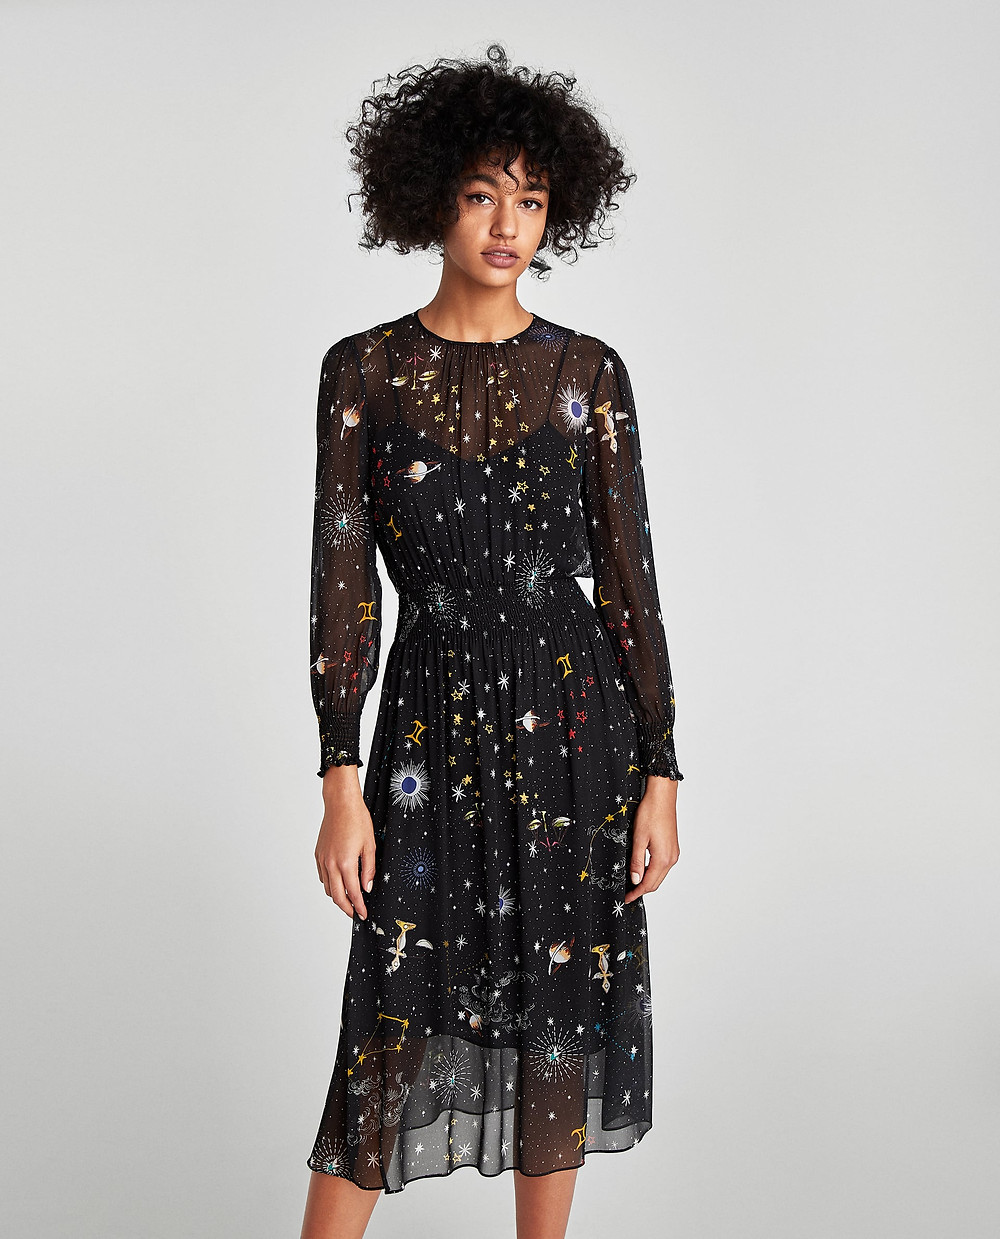 Zara Printed Midi Dress $90